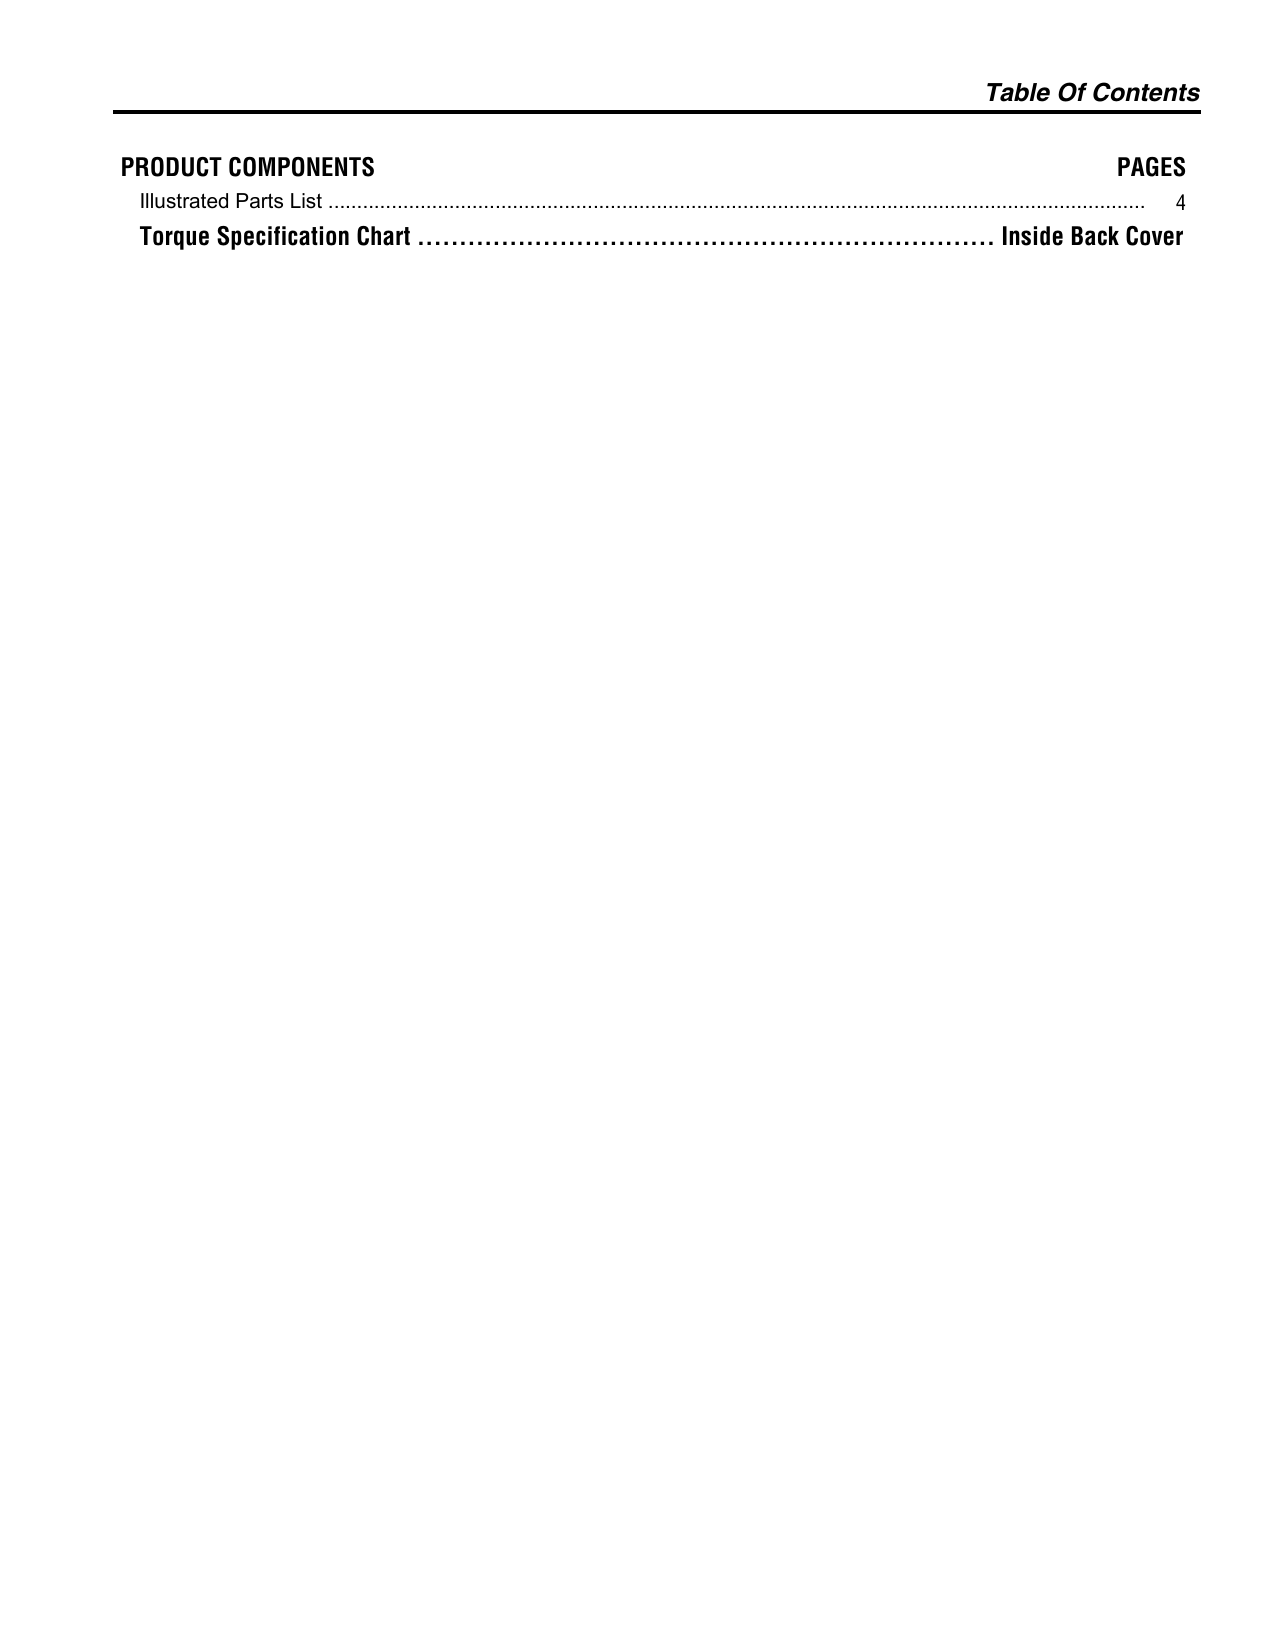 Simplicity 1694500 Parts Manual PartsManual